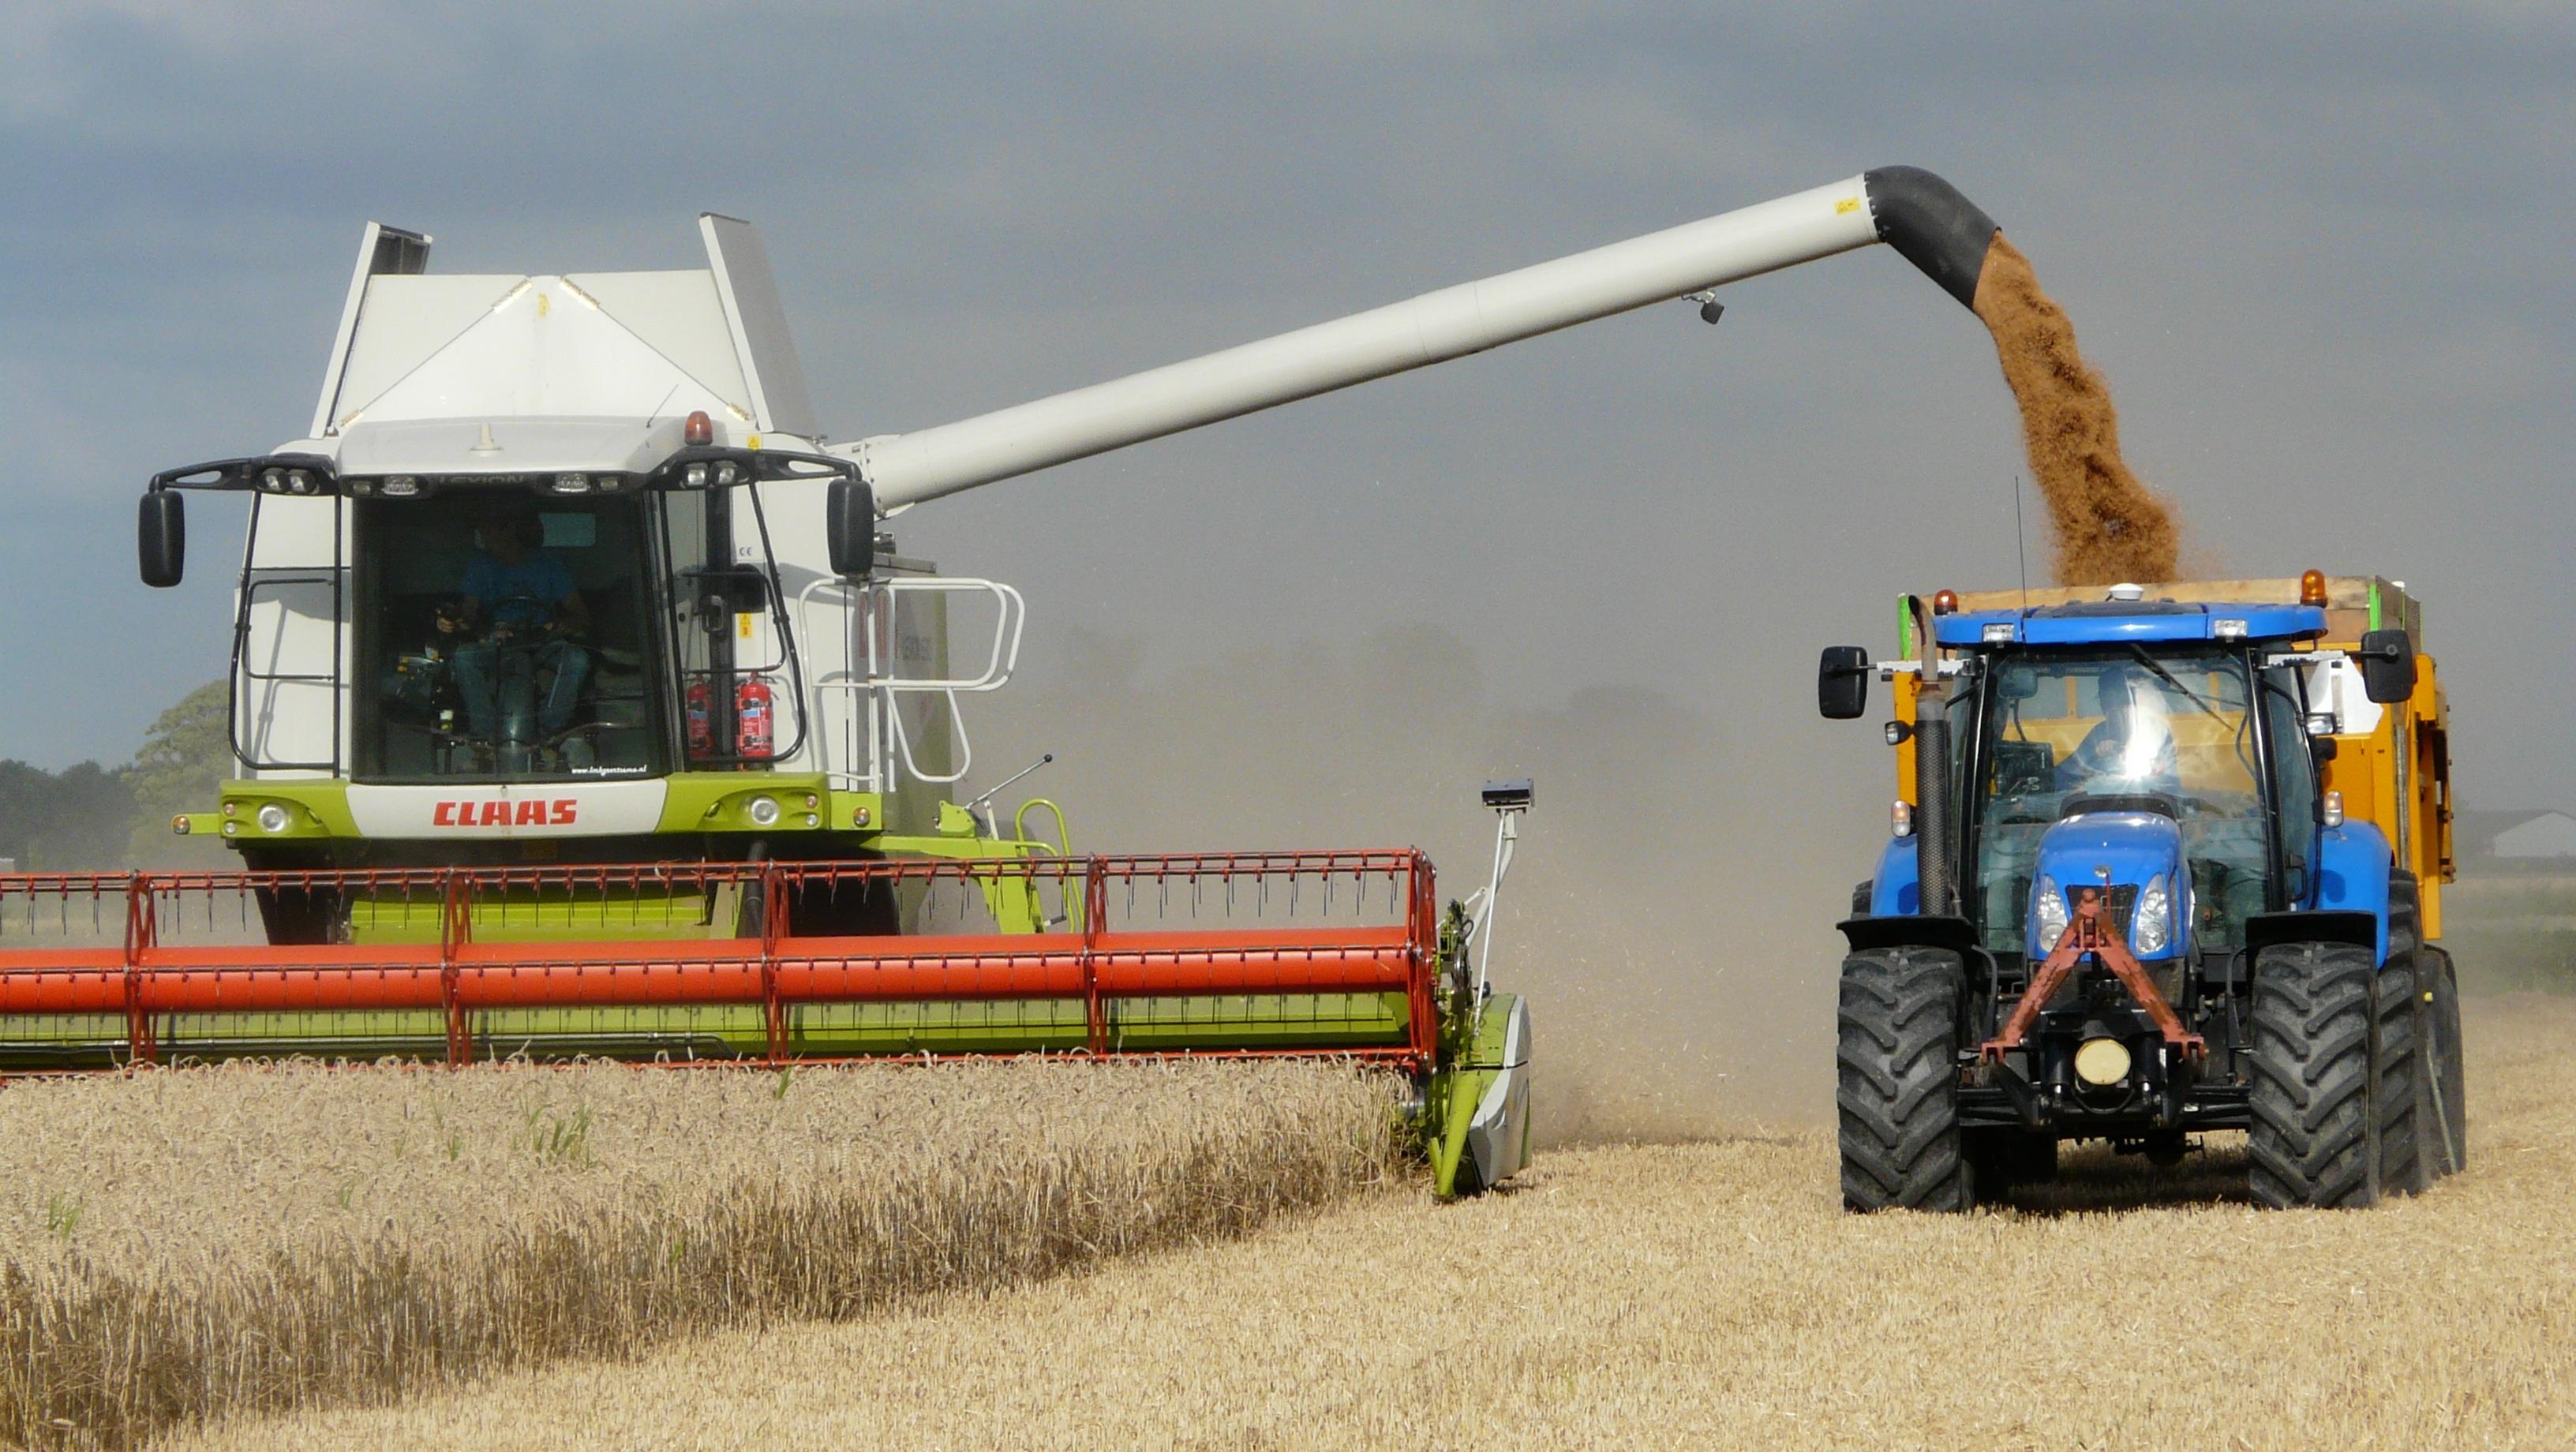 free images field vehicle crop machine agriculture harvester combine harvest time. Black Bedroom Furniture Sets. Home Design Ideas